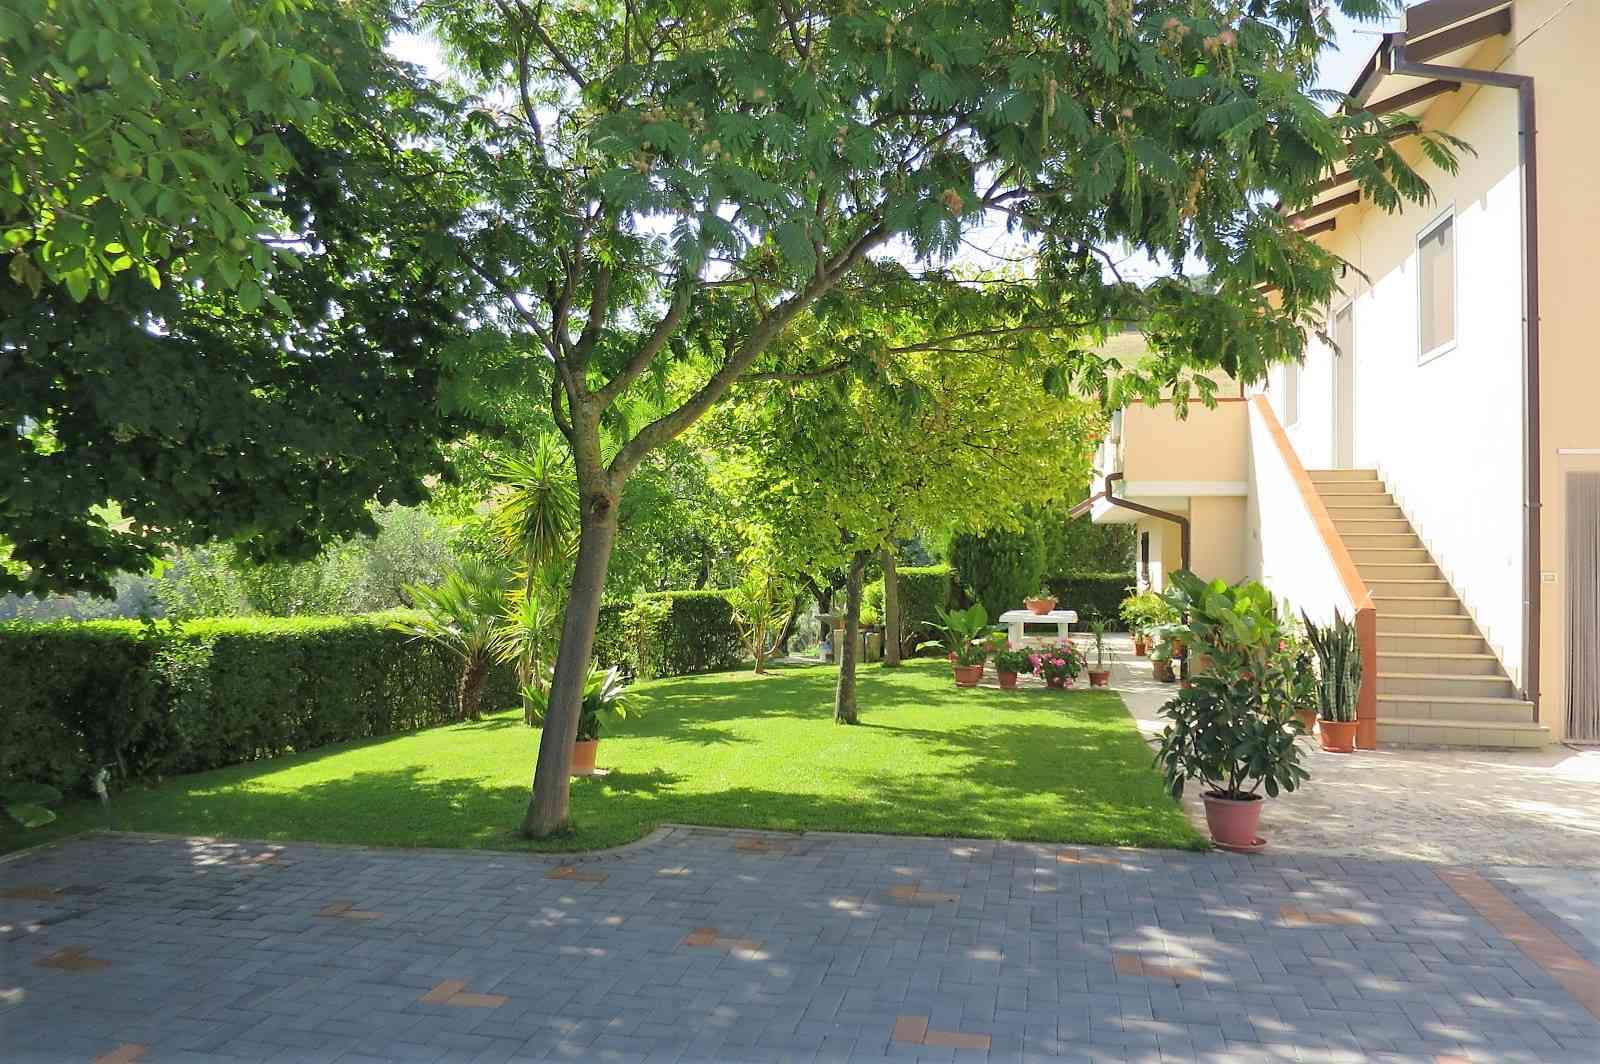 Casa di campagna Casa Nespolo - Loreto Aprutino - EUR 326.603